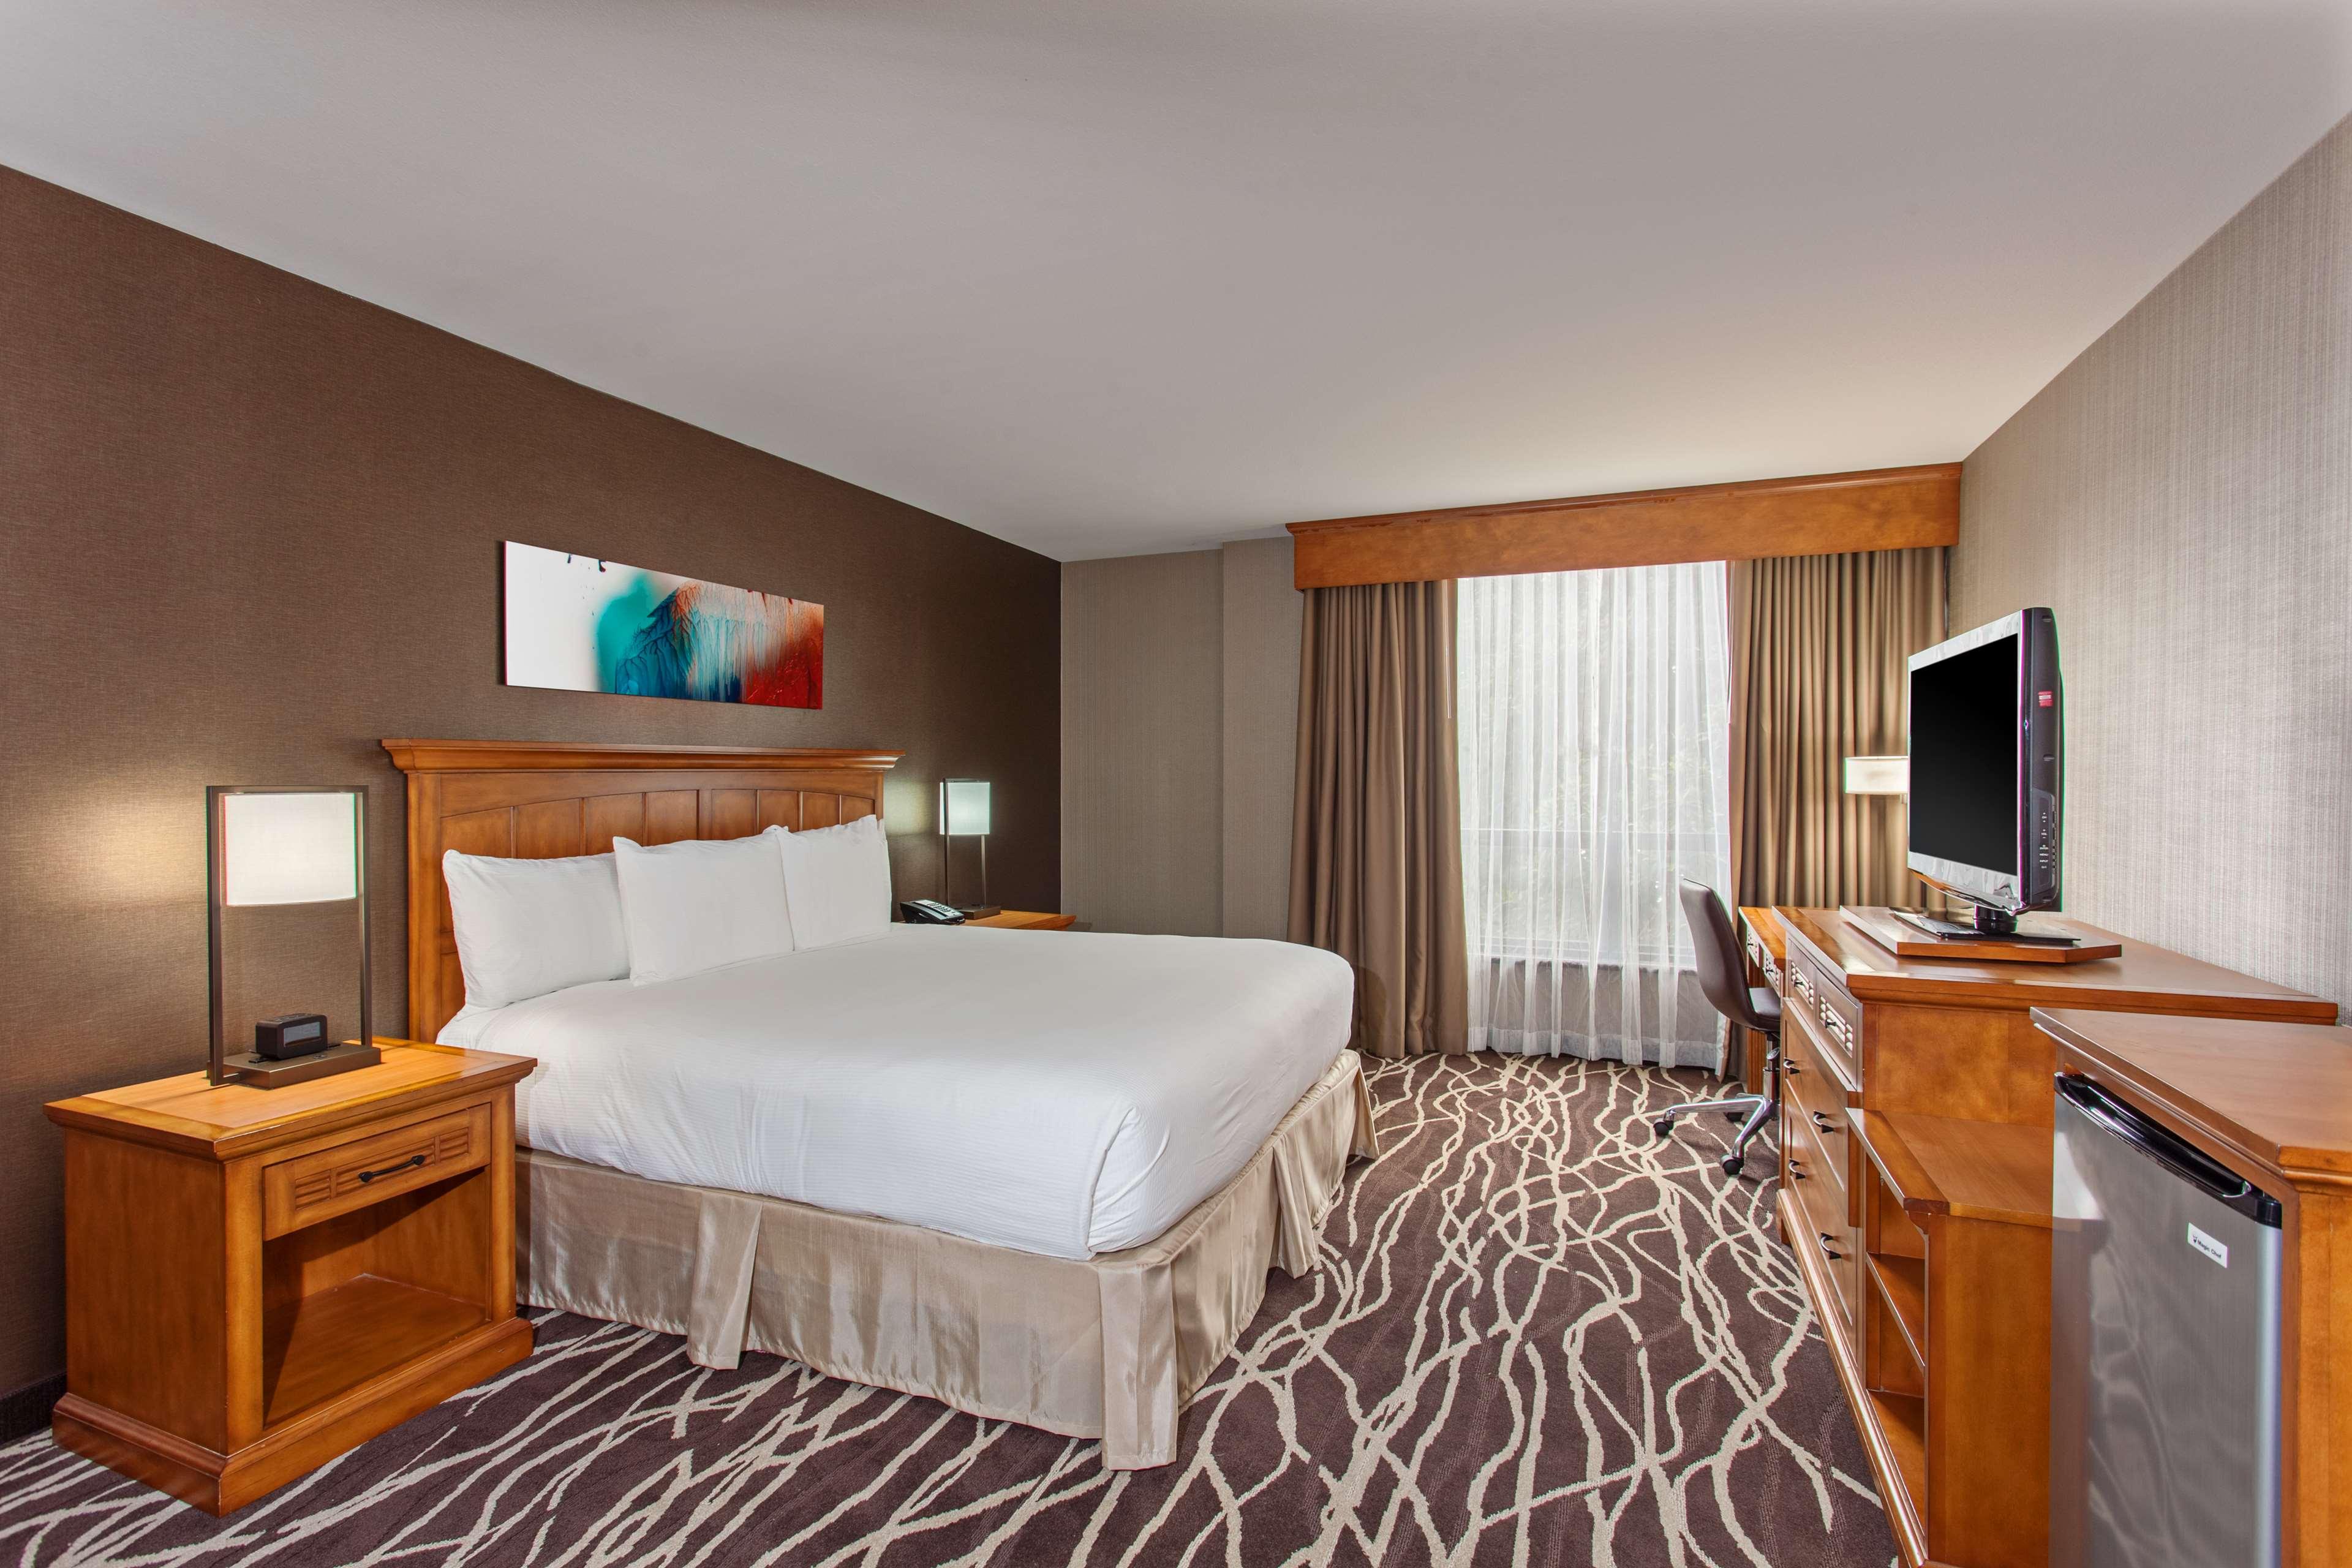 DoubleTree by Hilton Hotel San Bernardino image 20